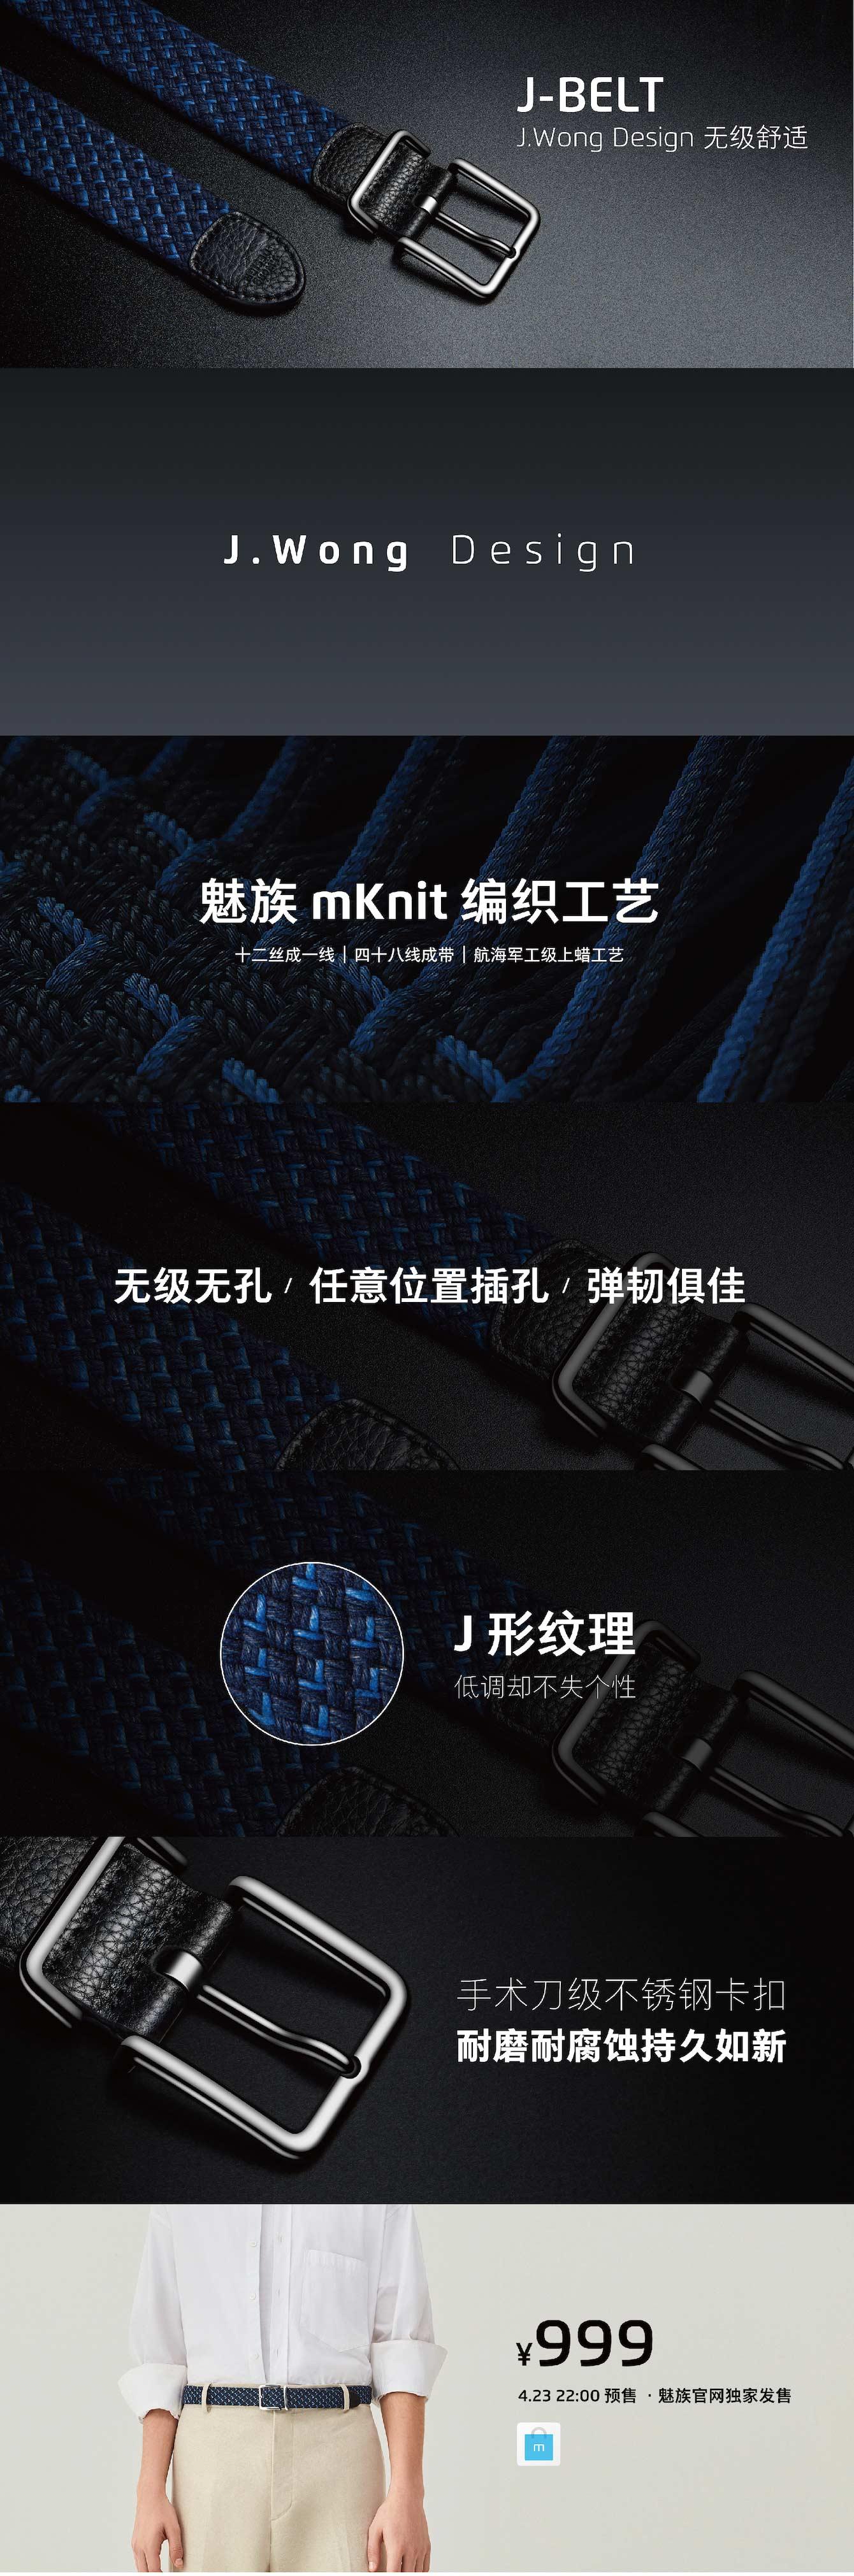 Презентация Meizu 16s